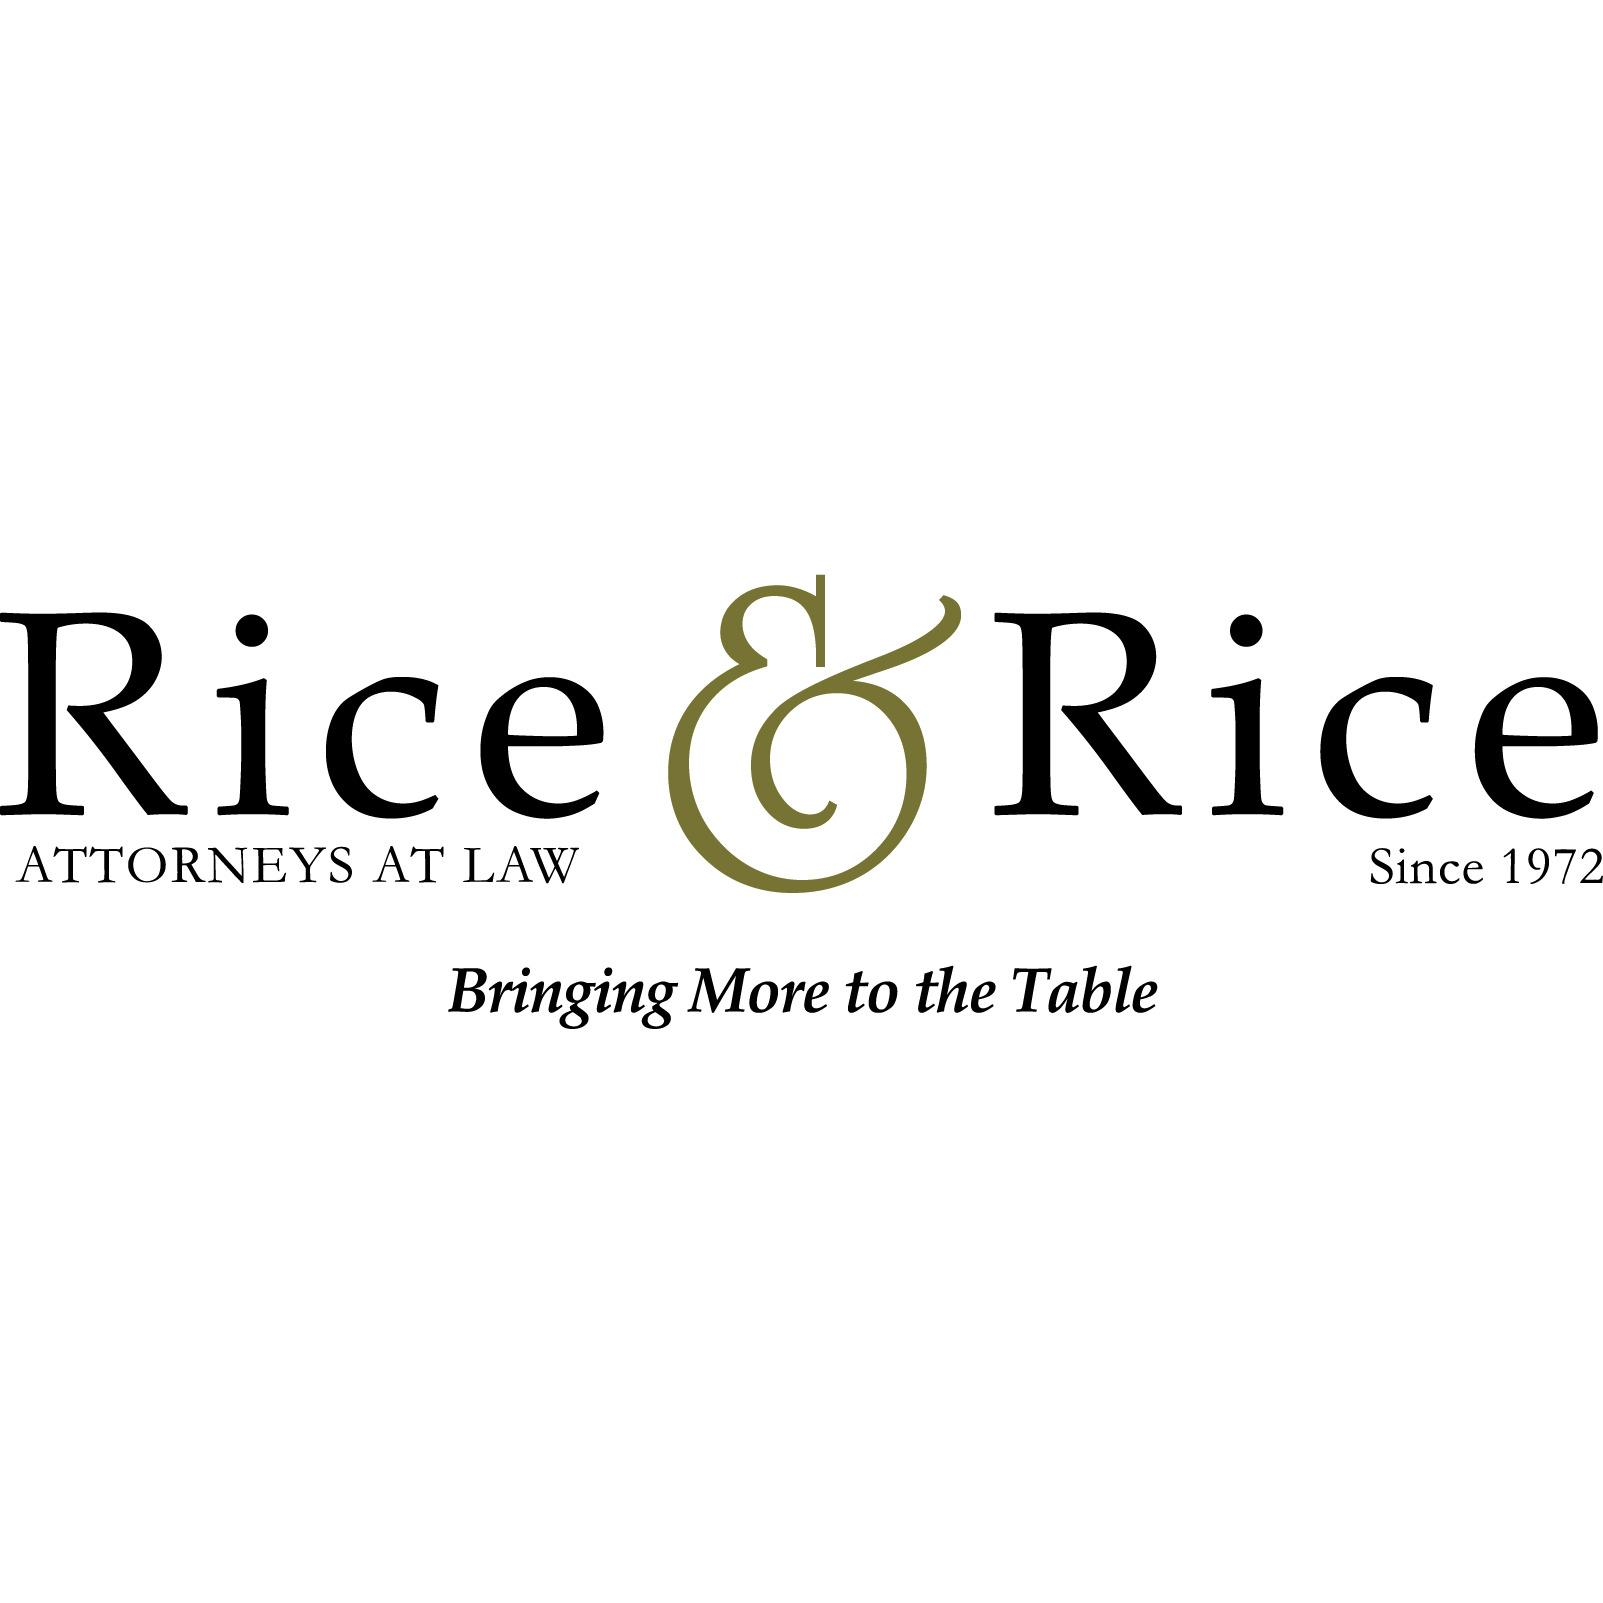 Rice & Rice Attorneys image 2